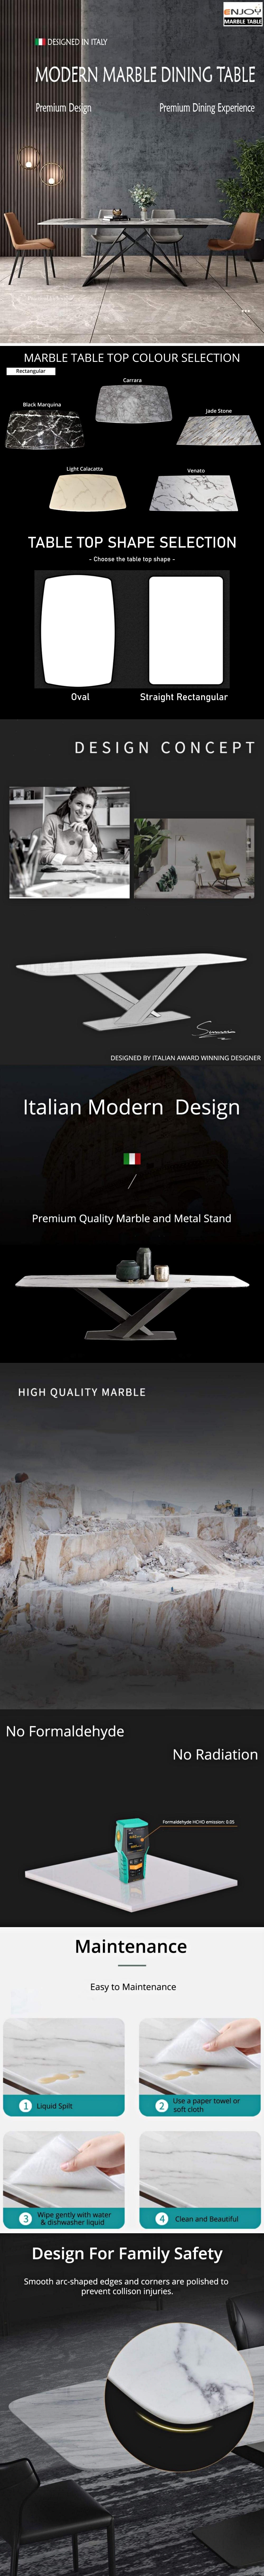 Rectangular-Triangular-Base-Dining-Table-Item-Description-1